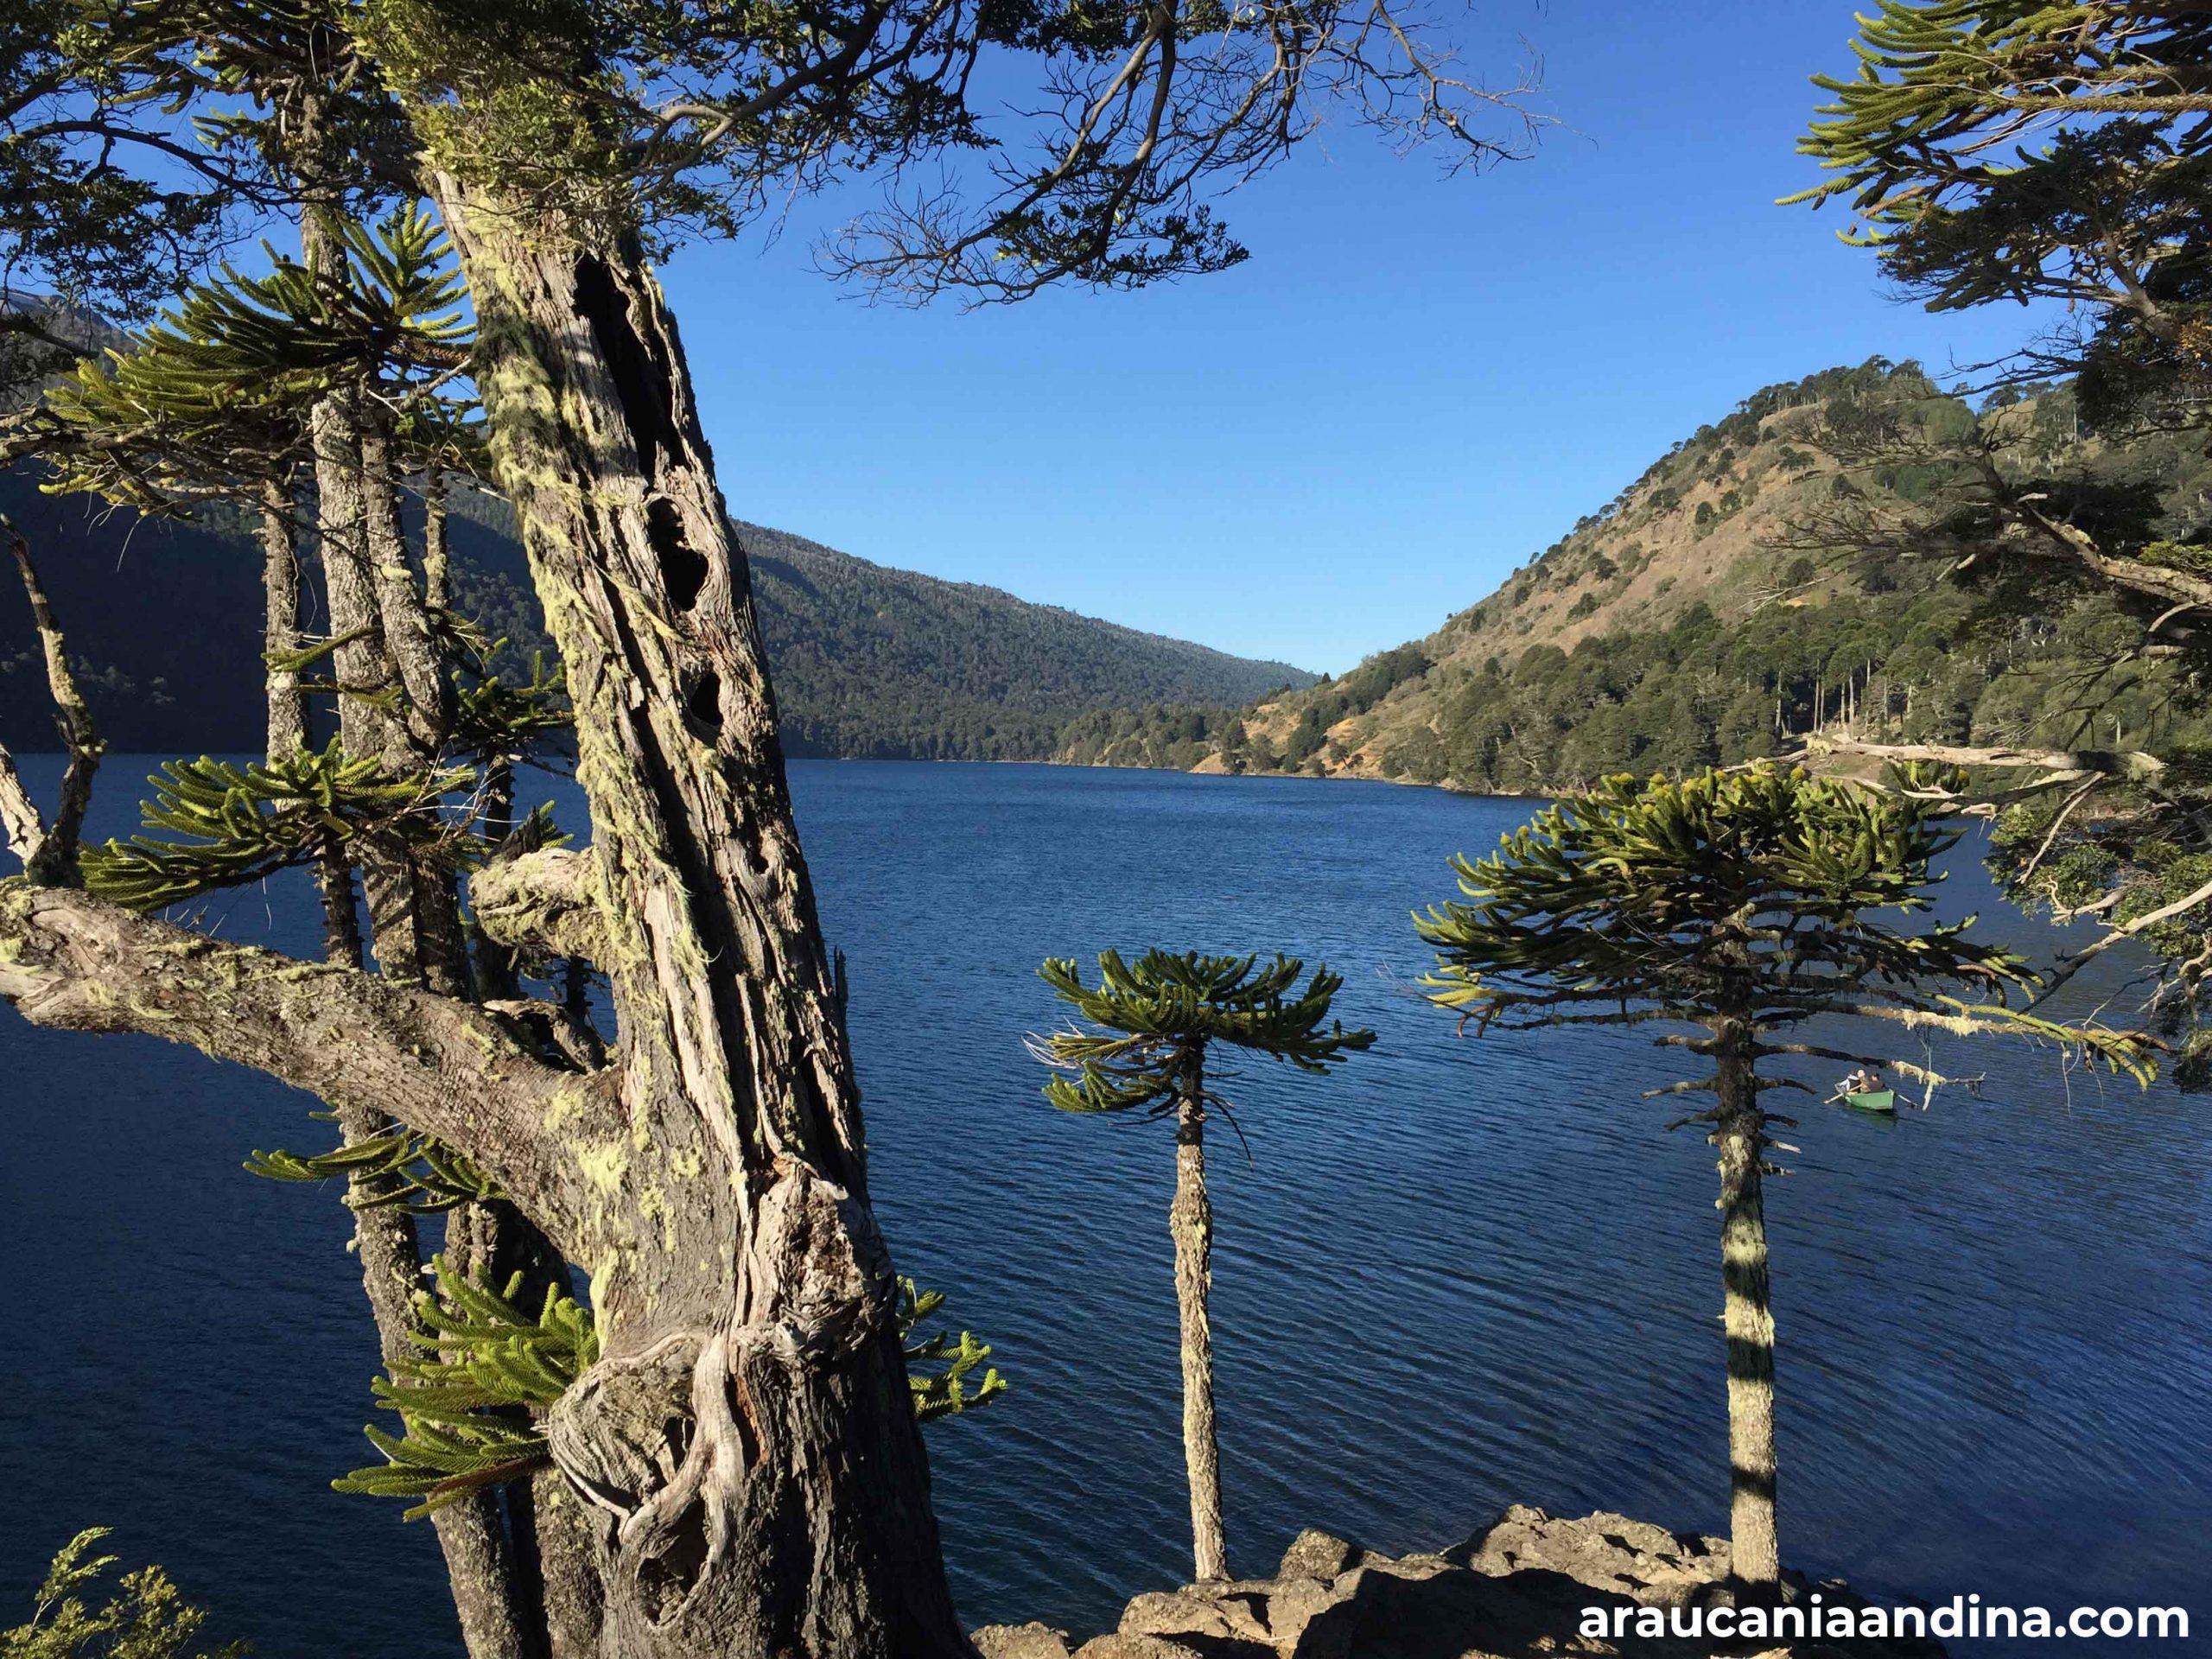 Araucanía Andina - Lago Icalma